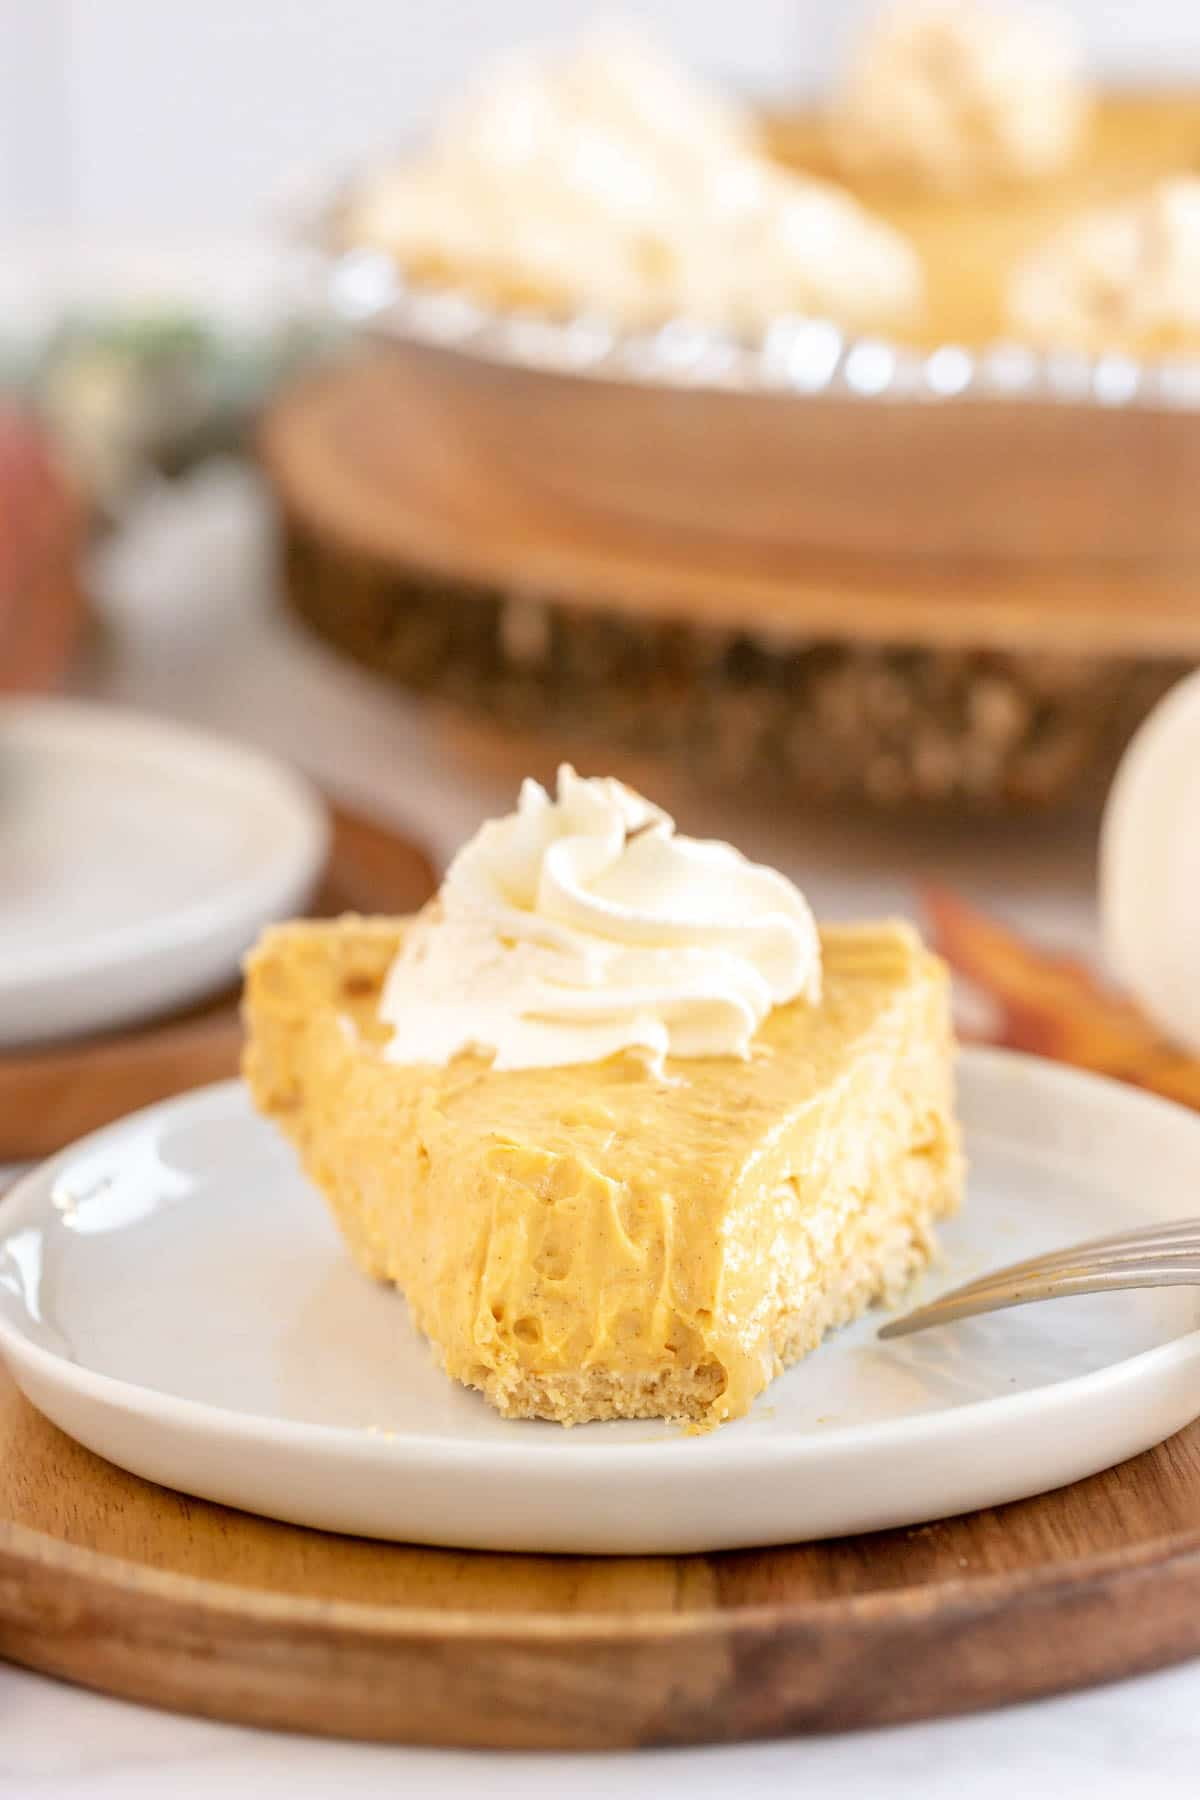 A slice o no bake pumpkin pie on a plate